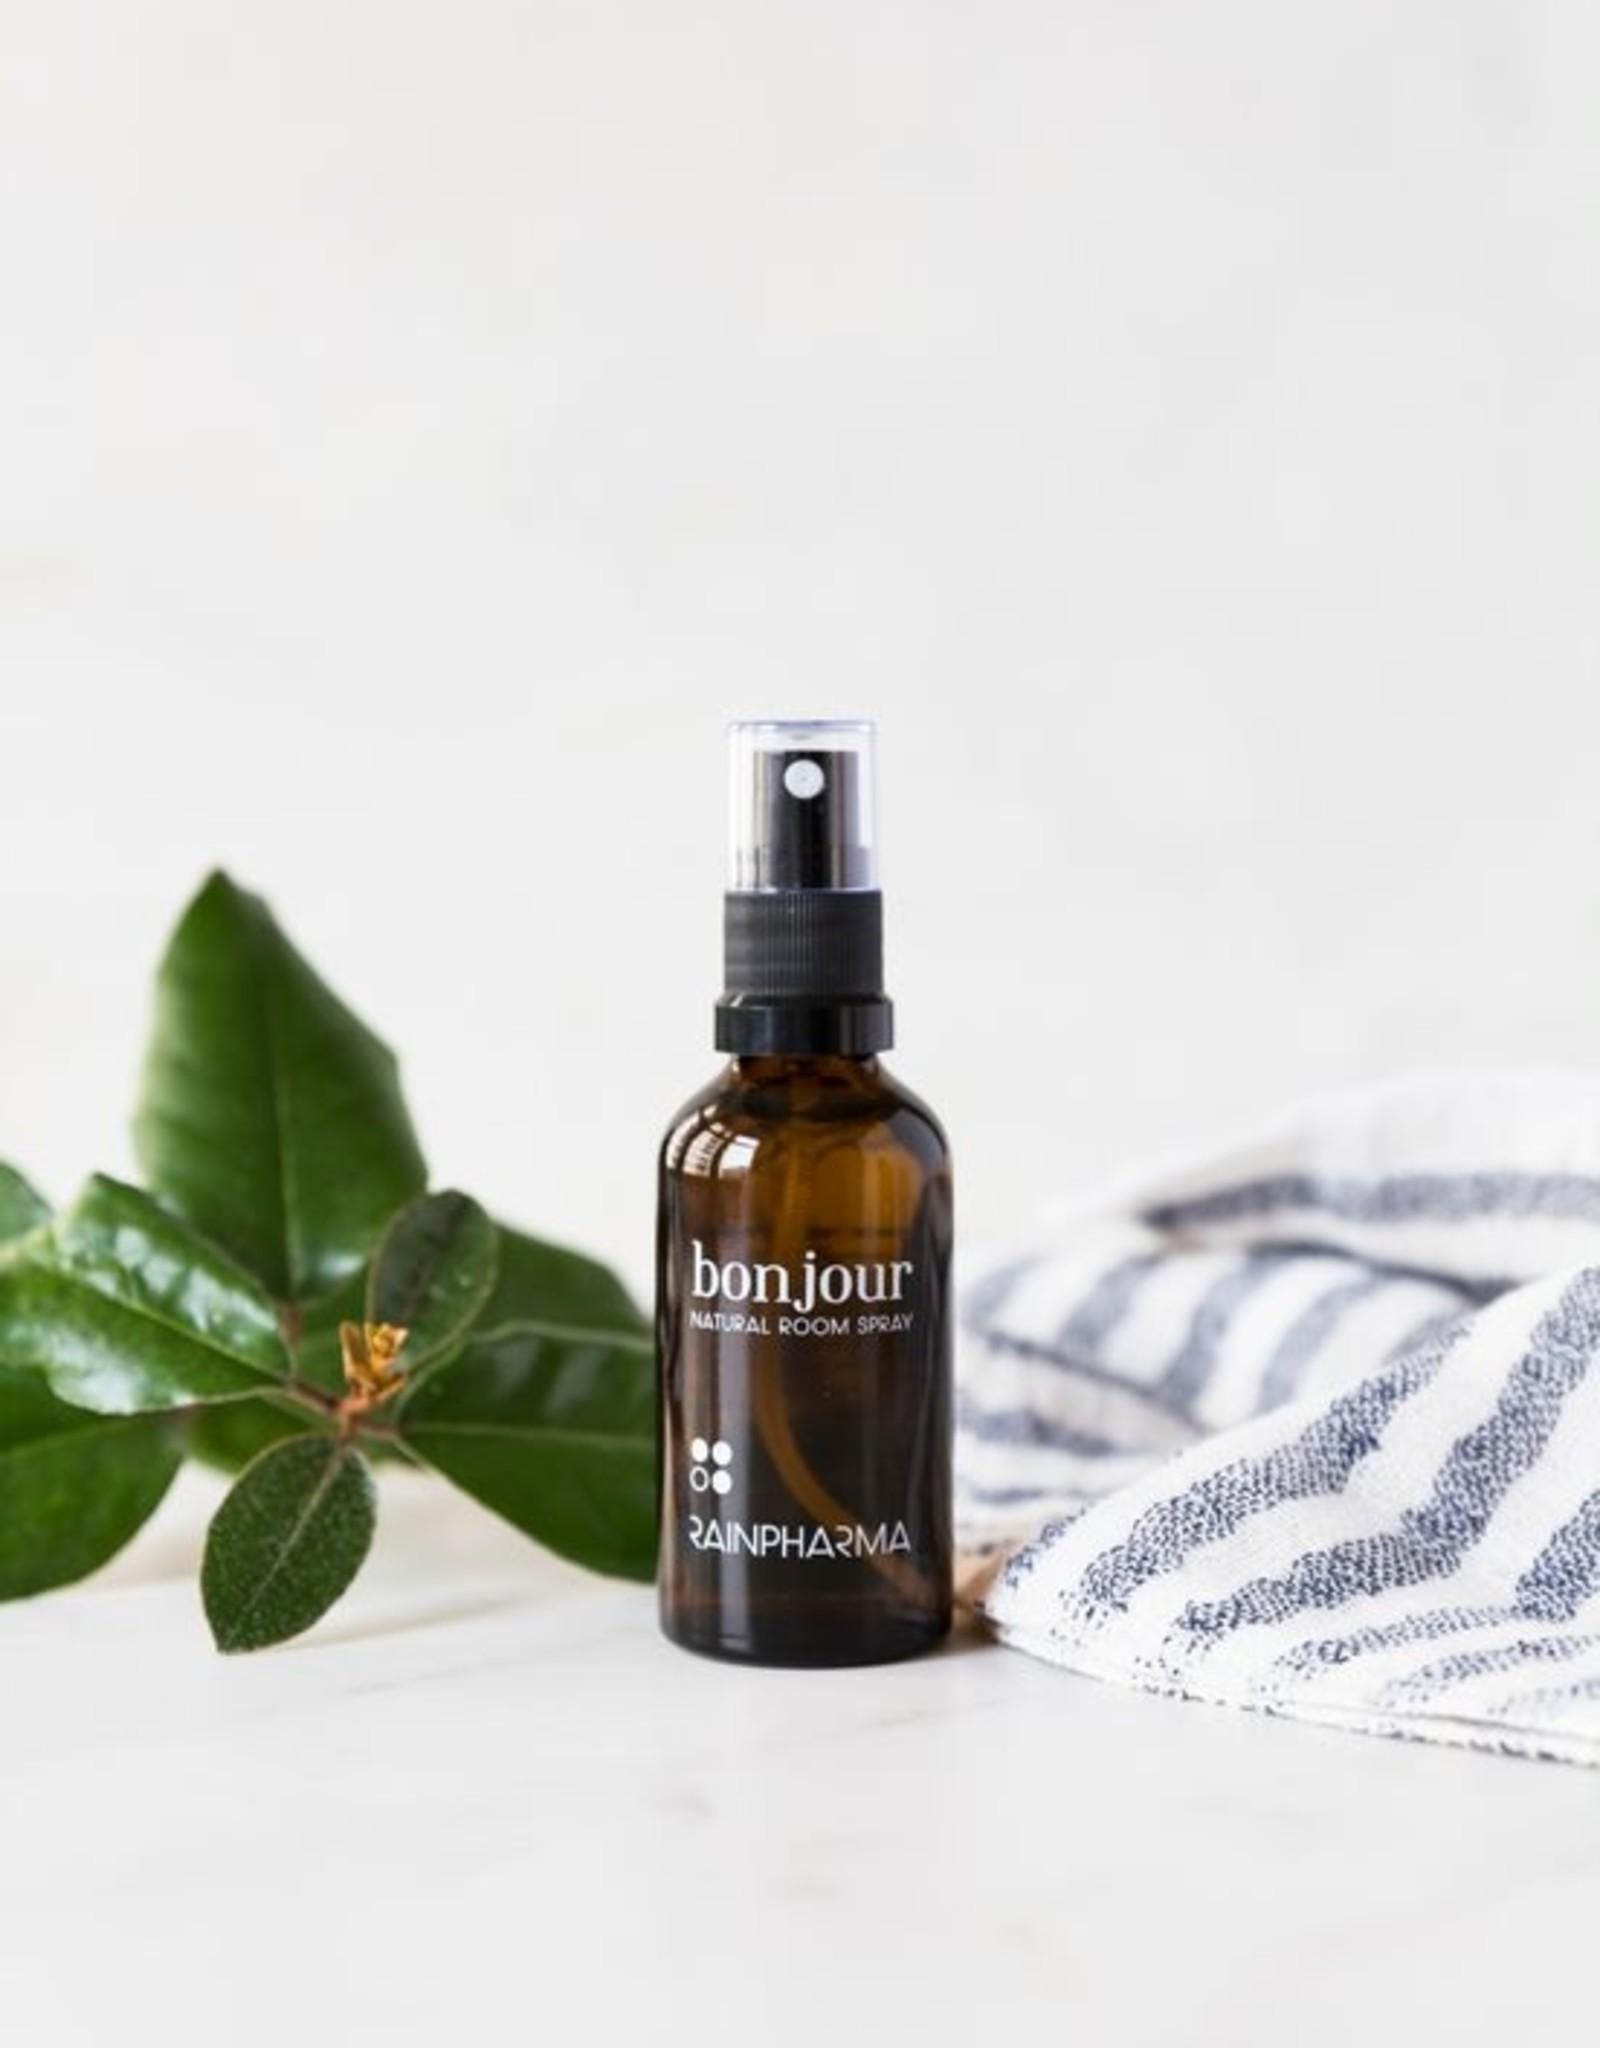 RainPharma PRE ORDER: Natural Room Spray Bonjour 50ml - Rainpharma